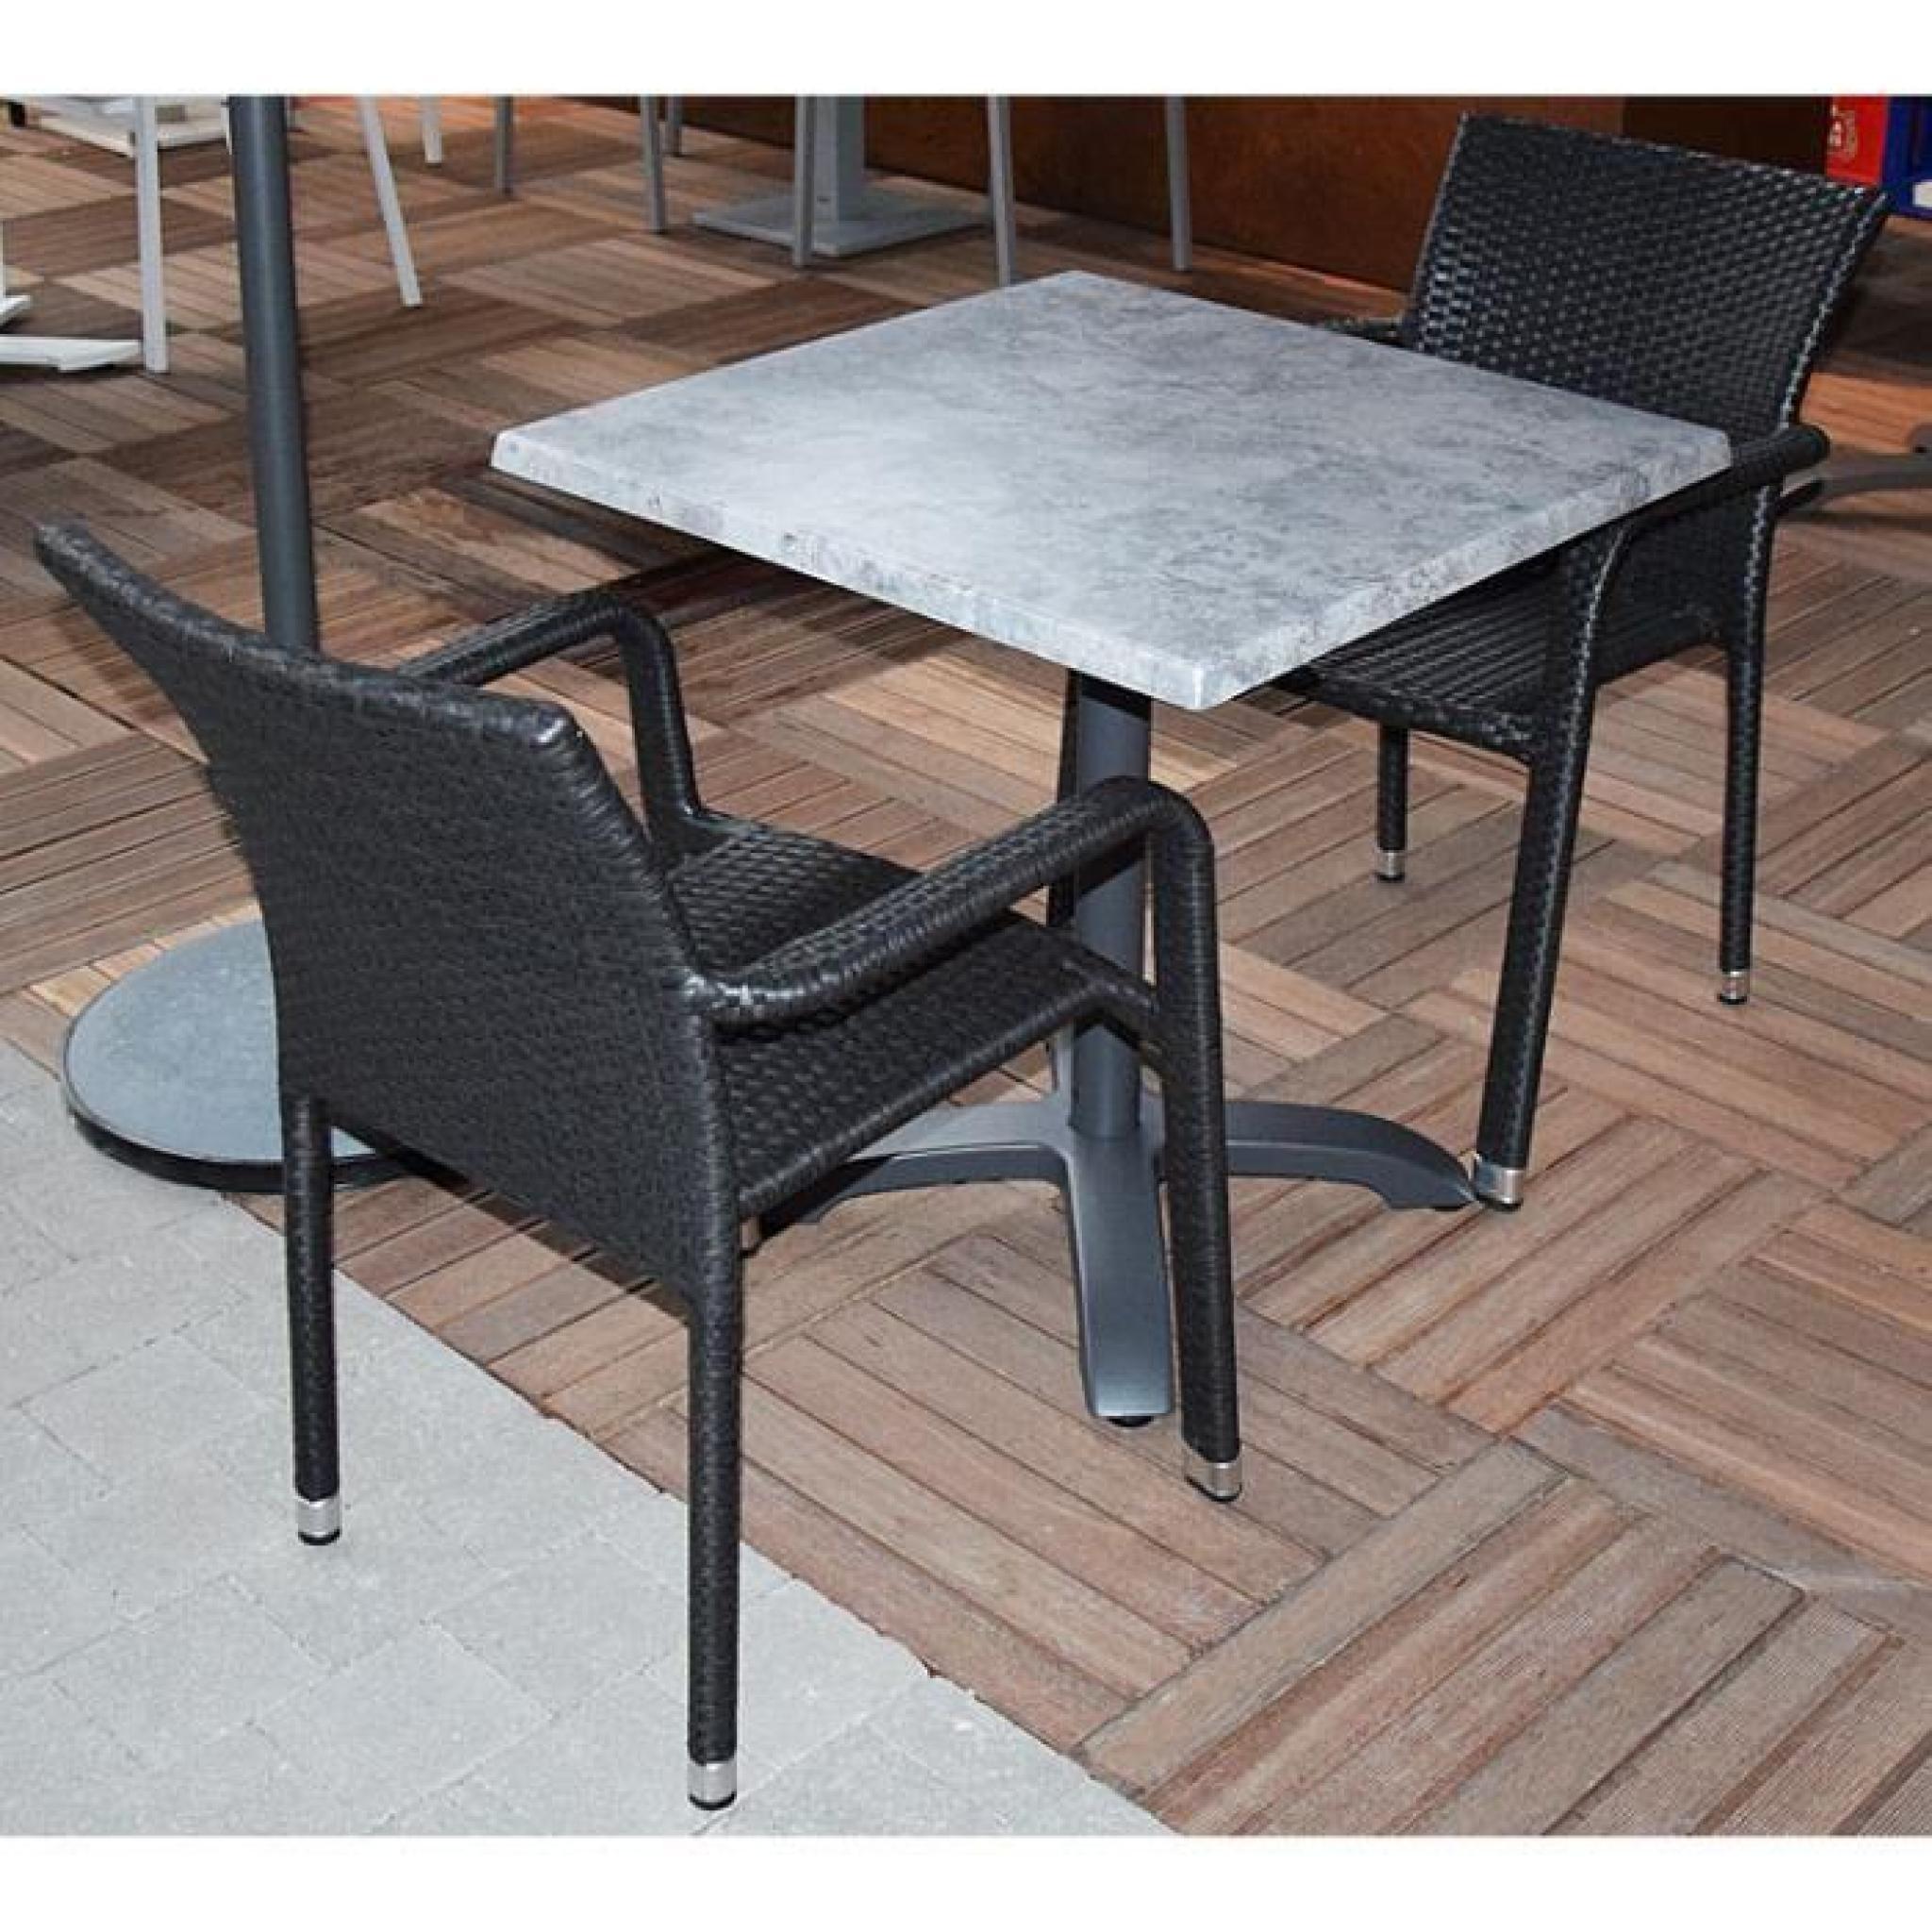 Salon oglio b ton table pliante alu 2 chaises r sine tress e gris achat vente salon de - Salon gris beton ...